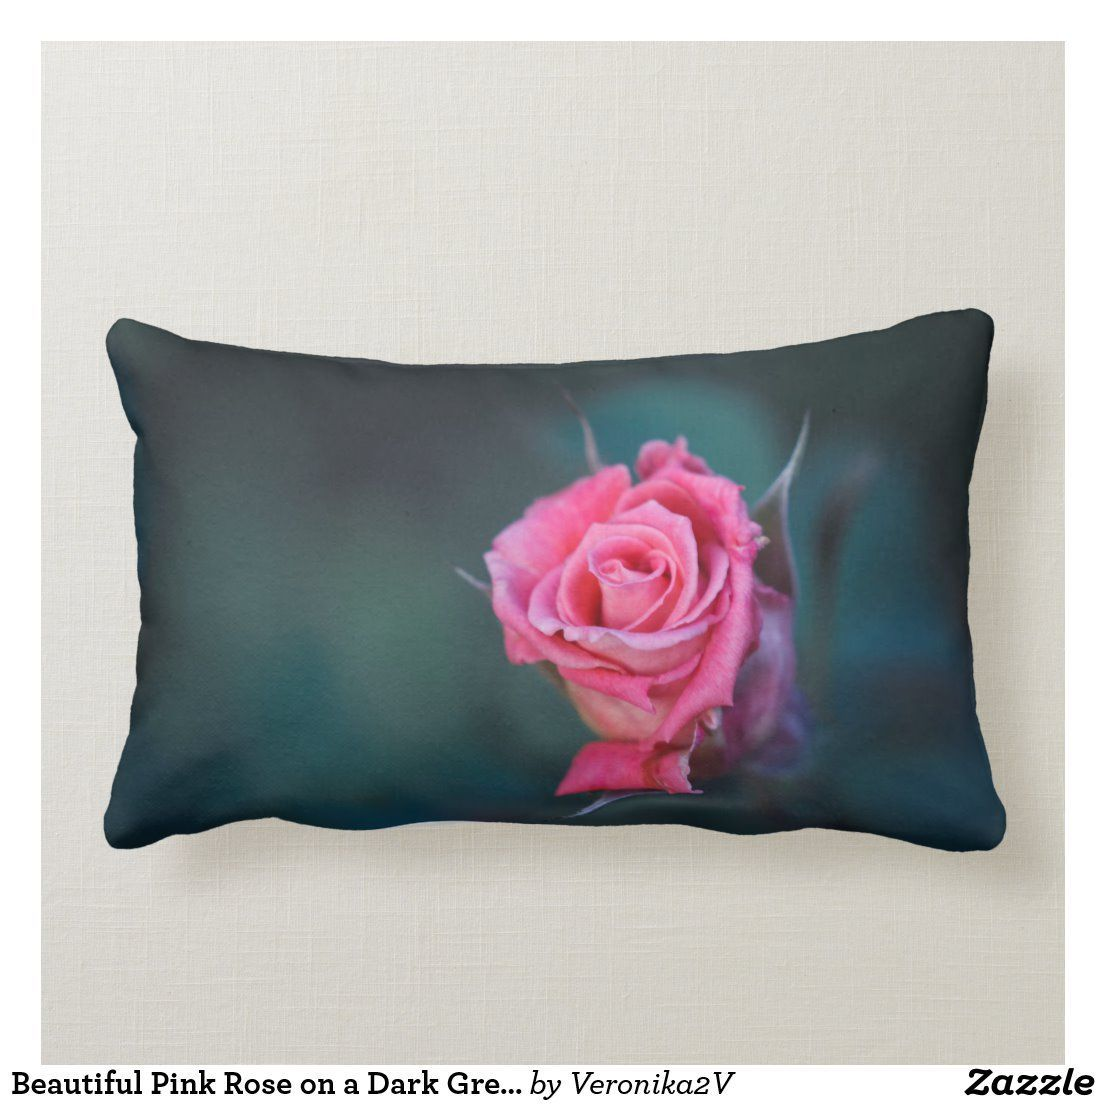 Beautiful Pink Rose On A Dark Green Background Lumbar Pillow Zazzle Com In 2020 Beautiful Pink Roses Dark Green Background Green Backgrounds